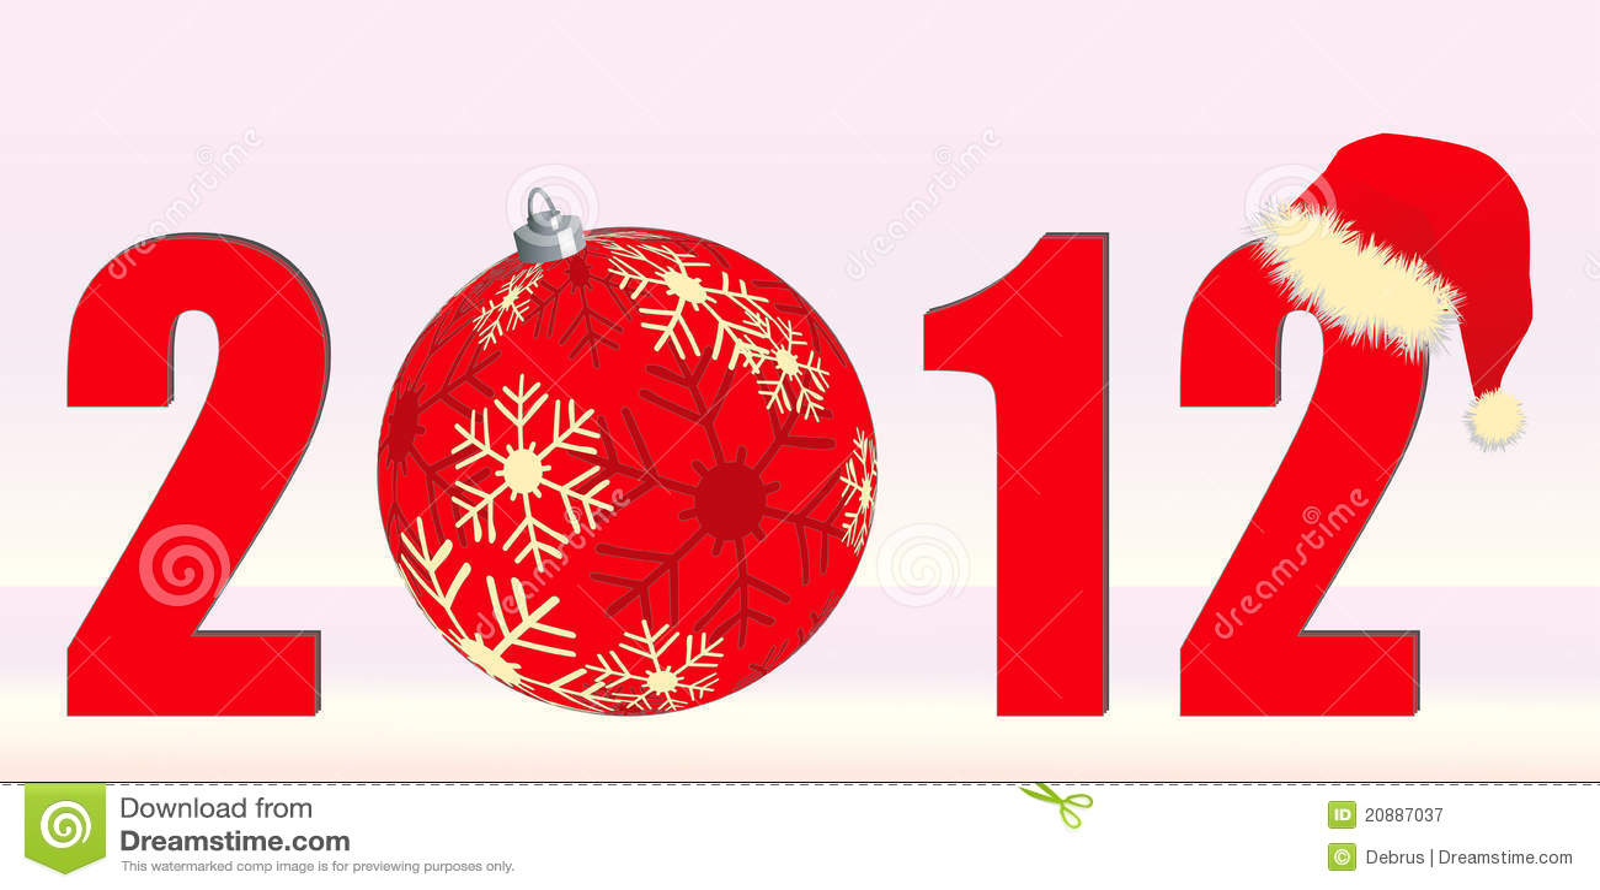 Kerstmis themed 2012 met kerstmissnuisterij en de hoed van de kerstman